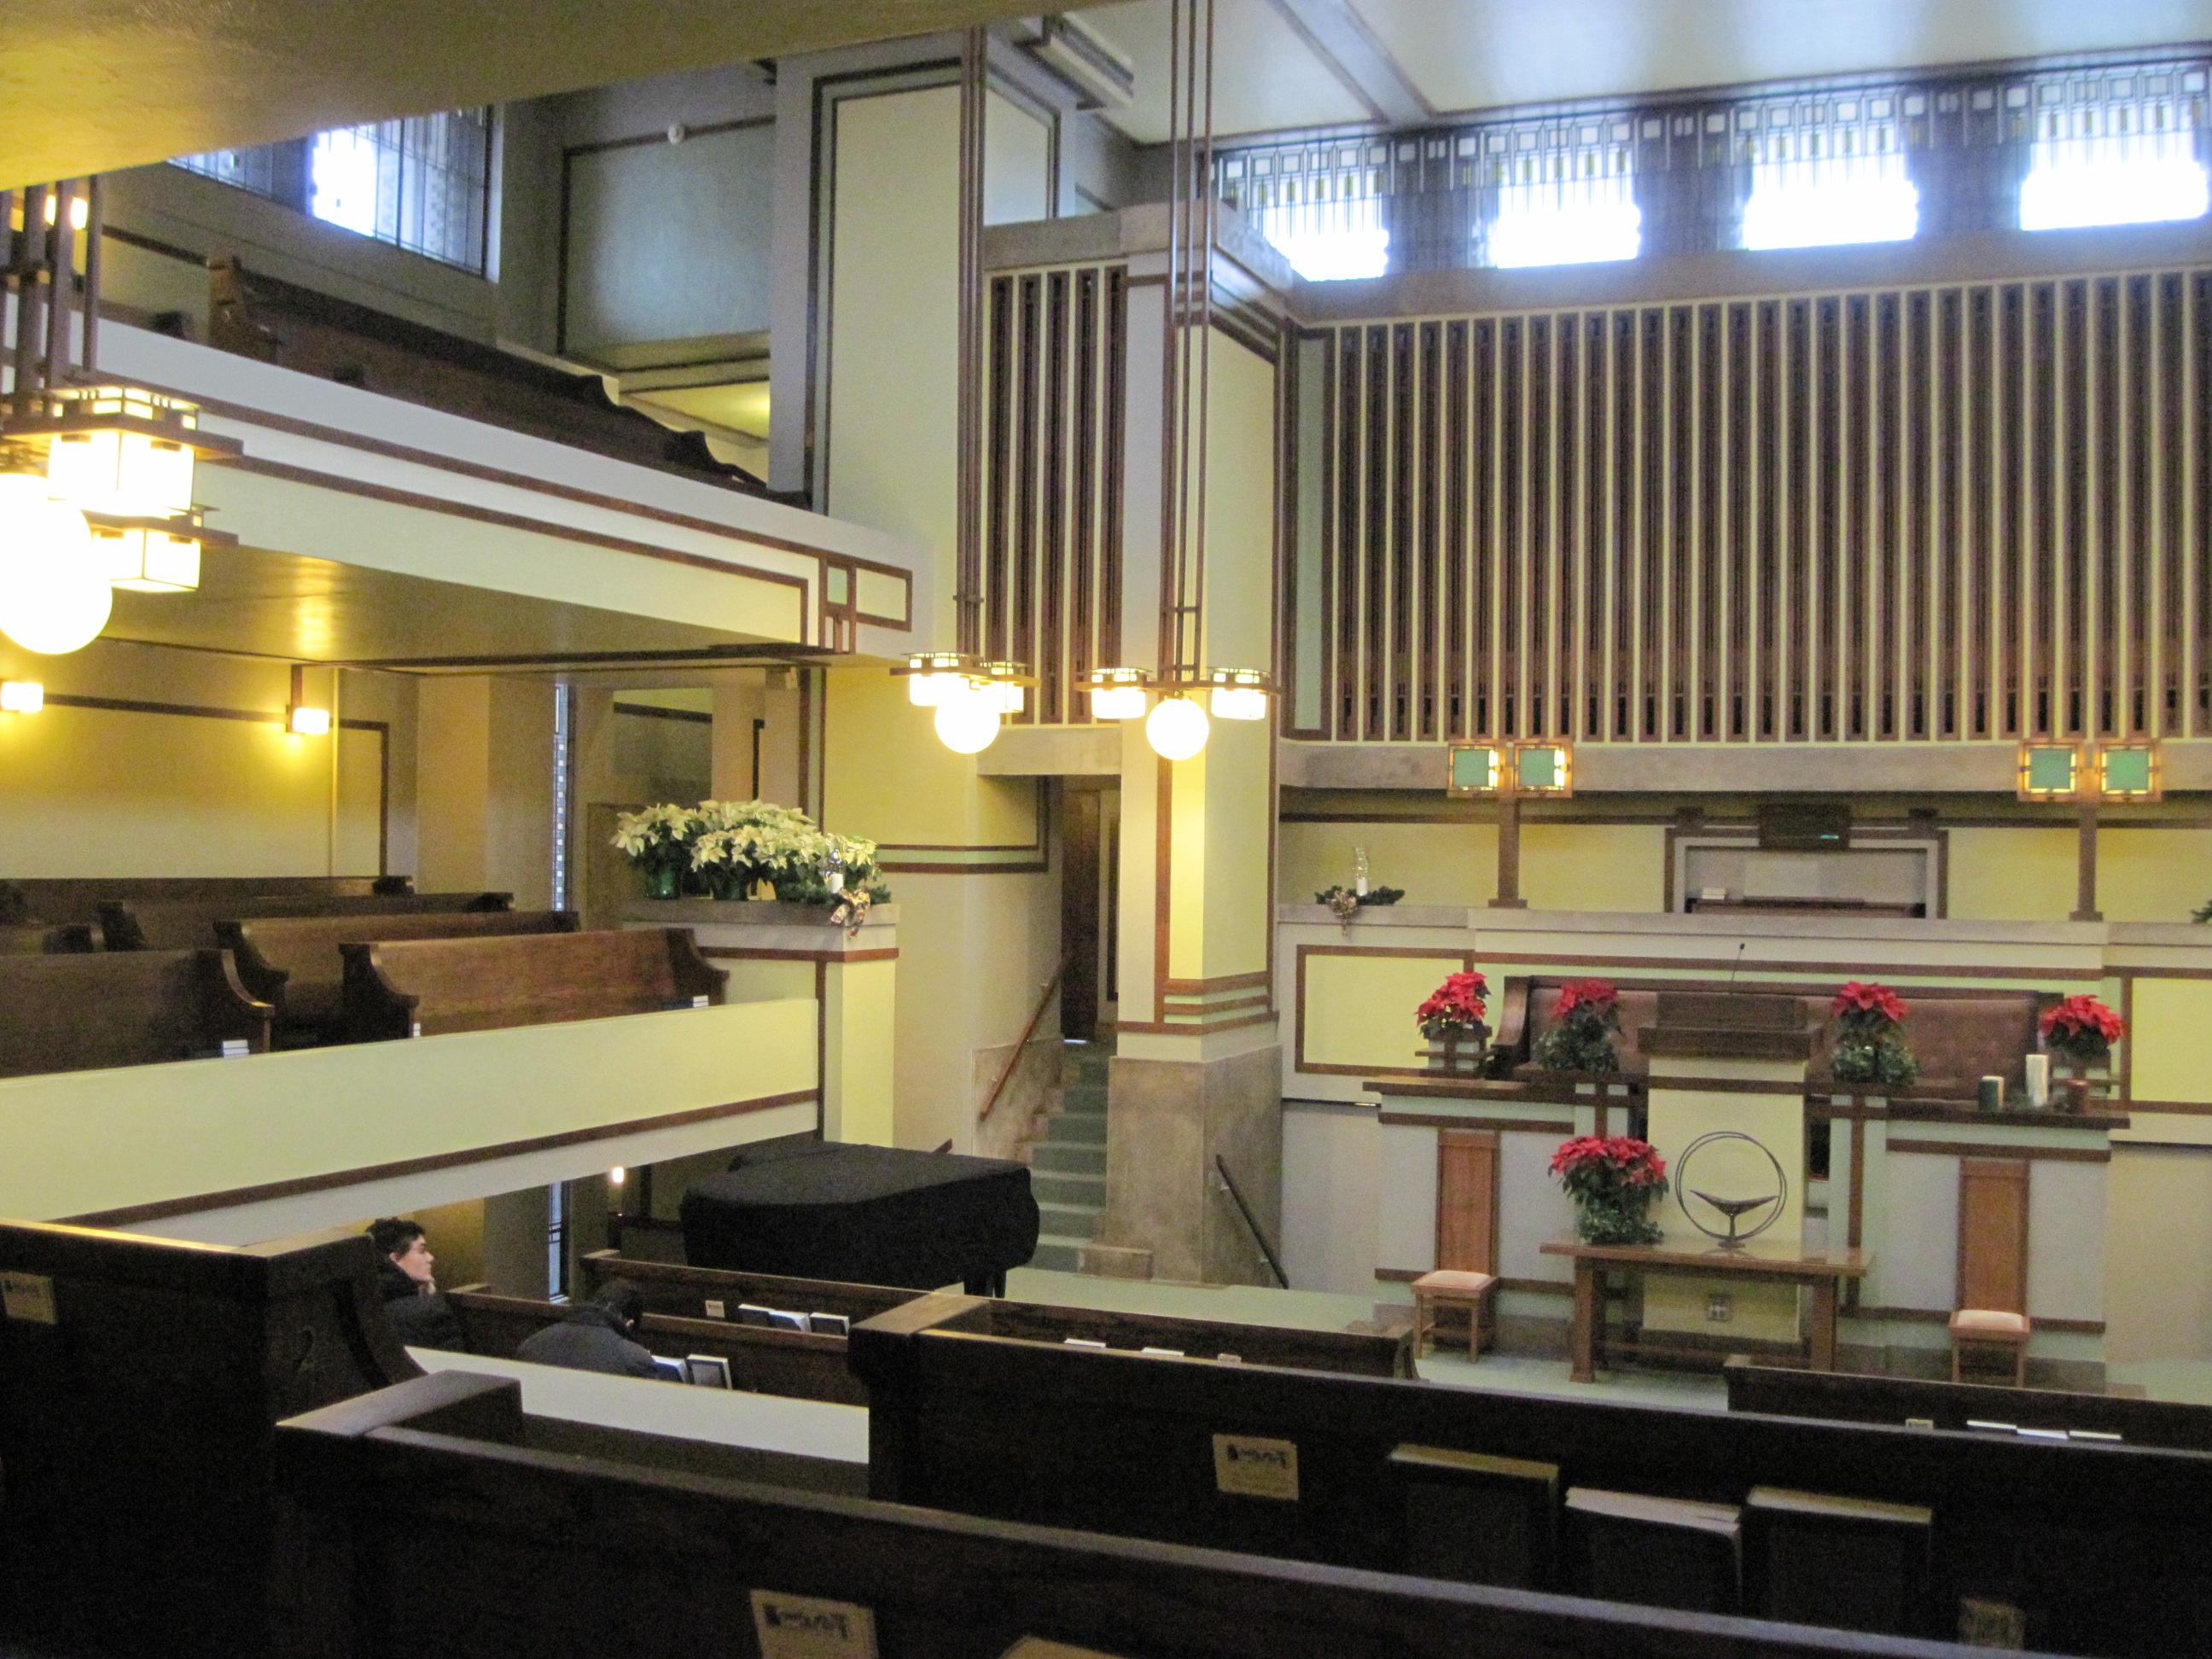 Frank Lloyd Wright's Unity Temple